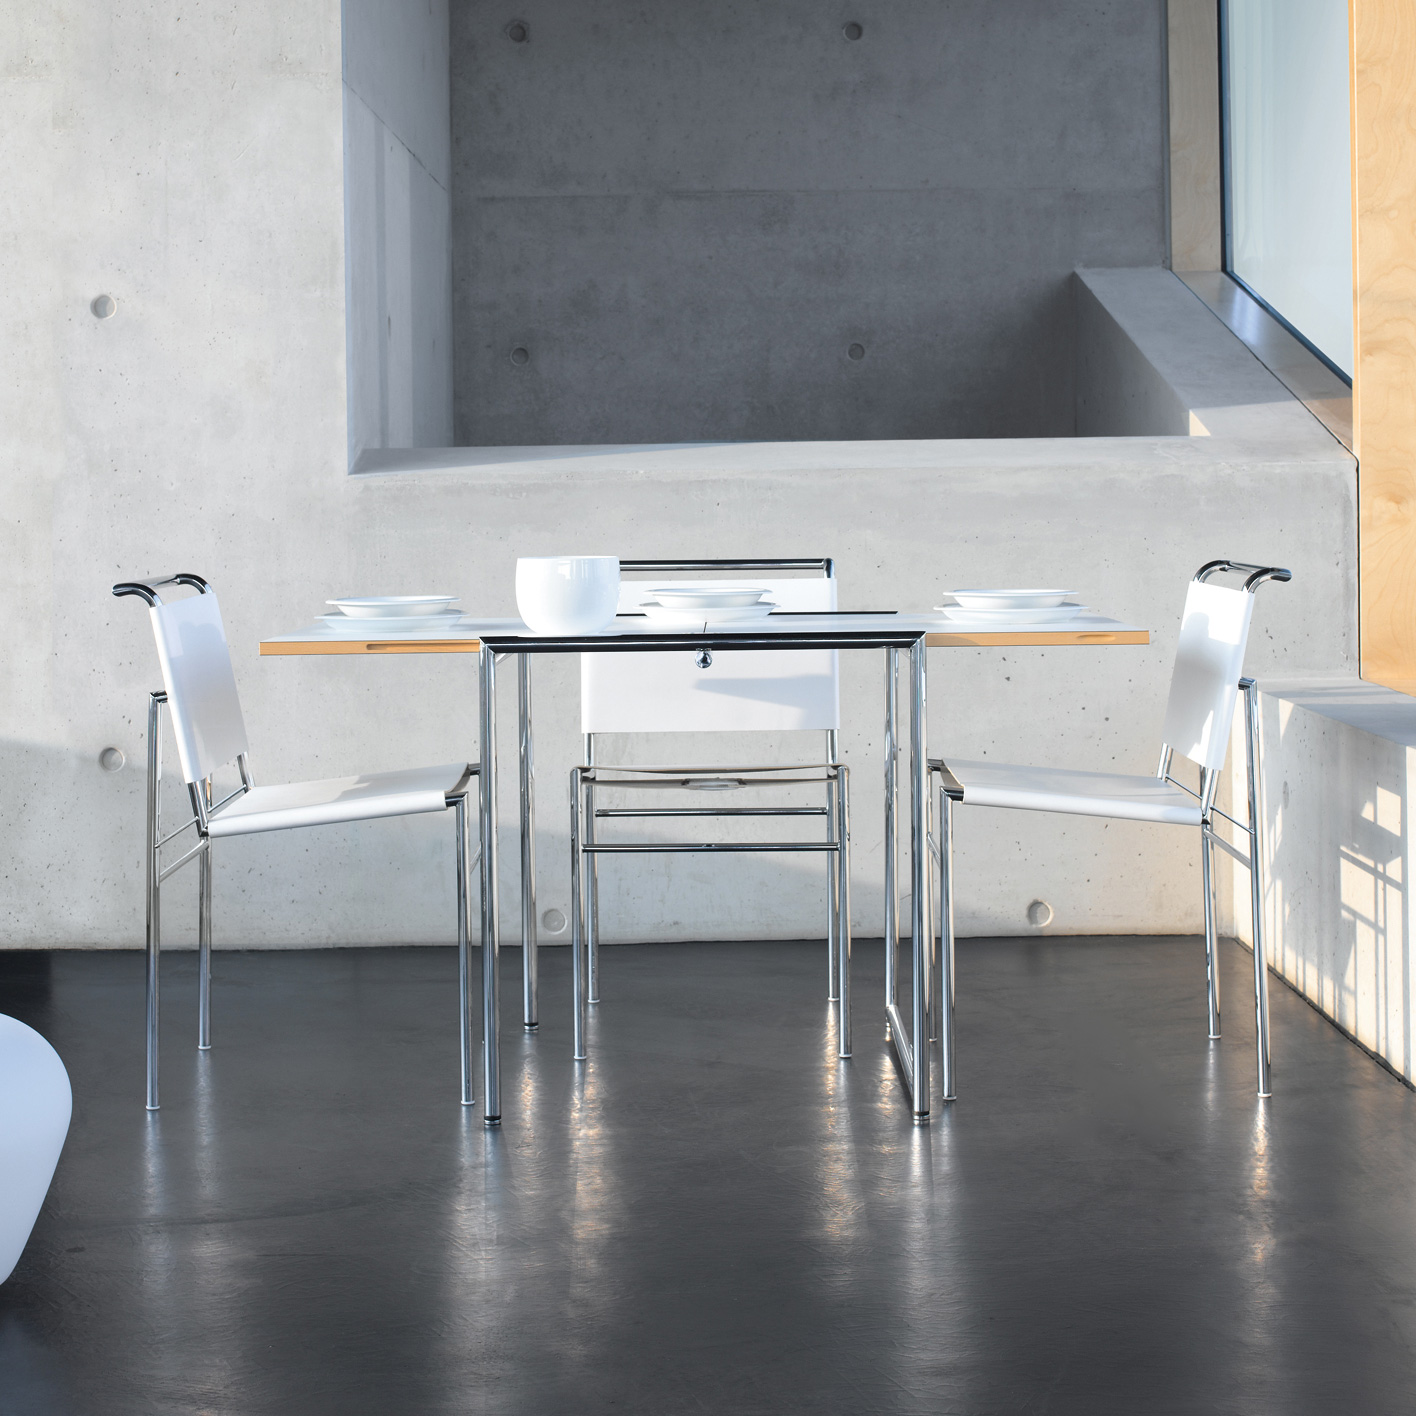 classicon jean ausklappbarer tisch 103jea01 00 reuter onlineshop. Black Bedroom Furniture Sets. Home Design Ideas